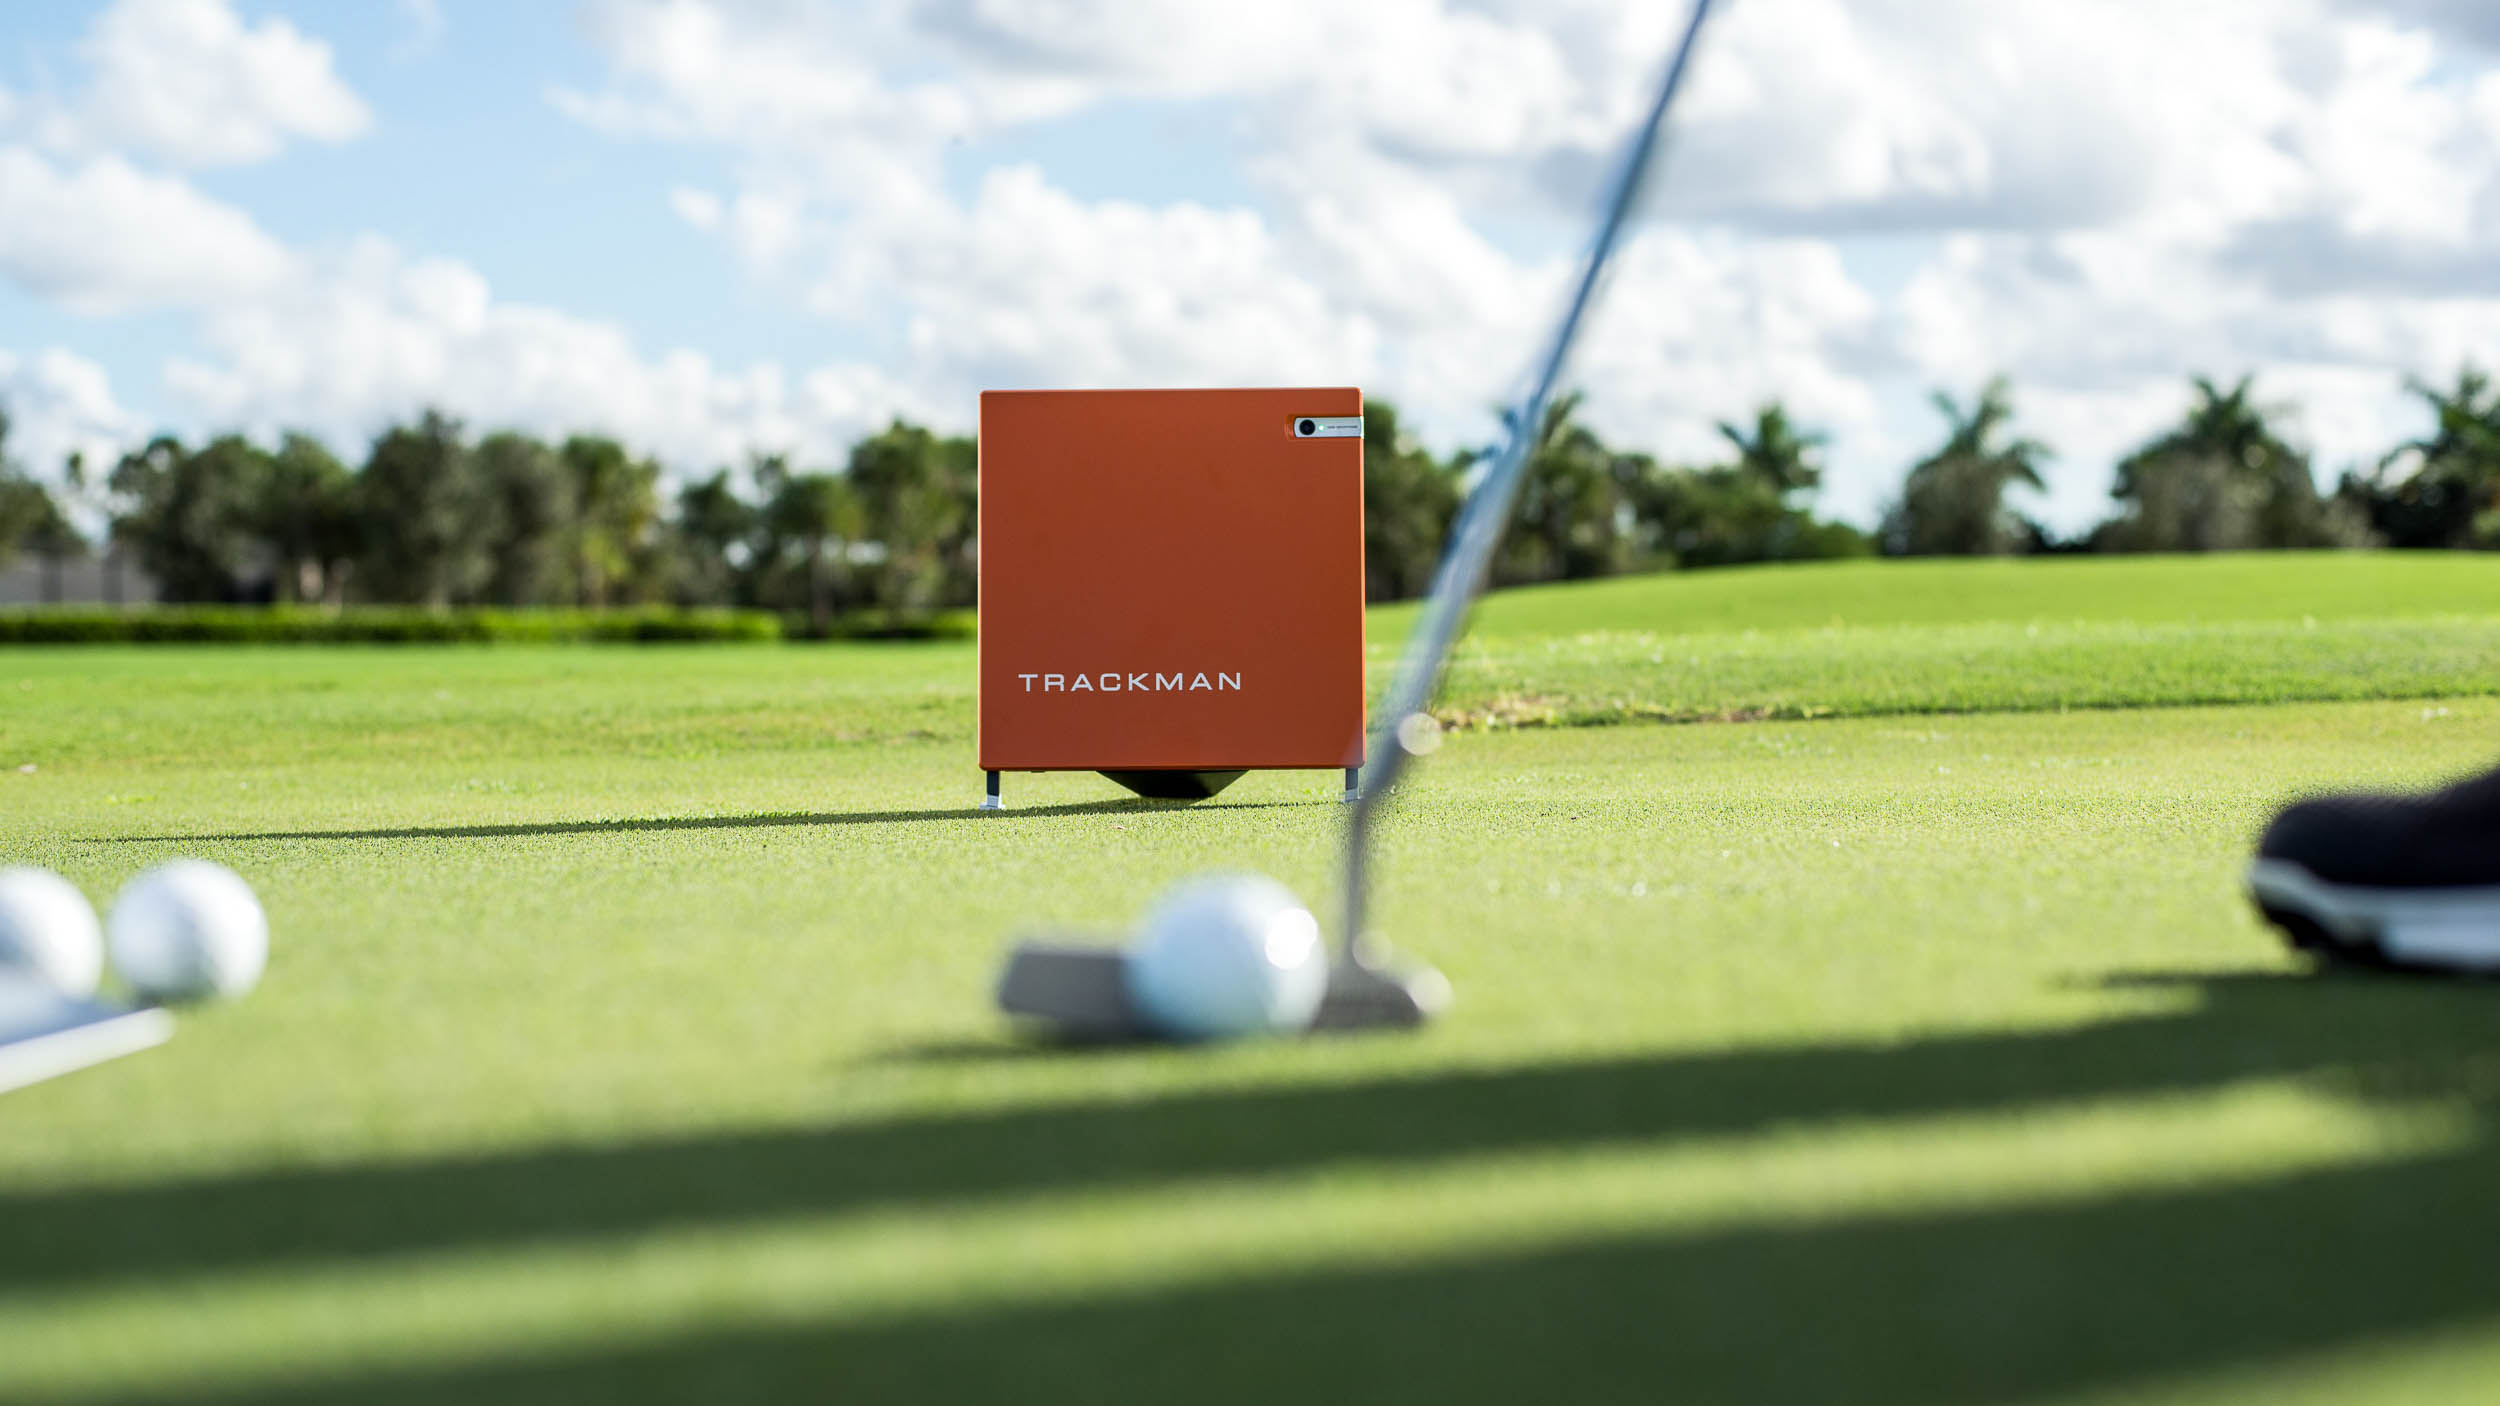 Trackman technology monitors a golf putt